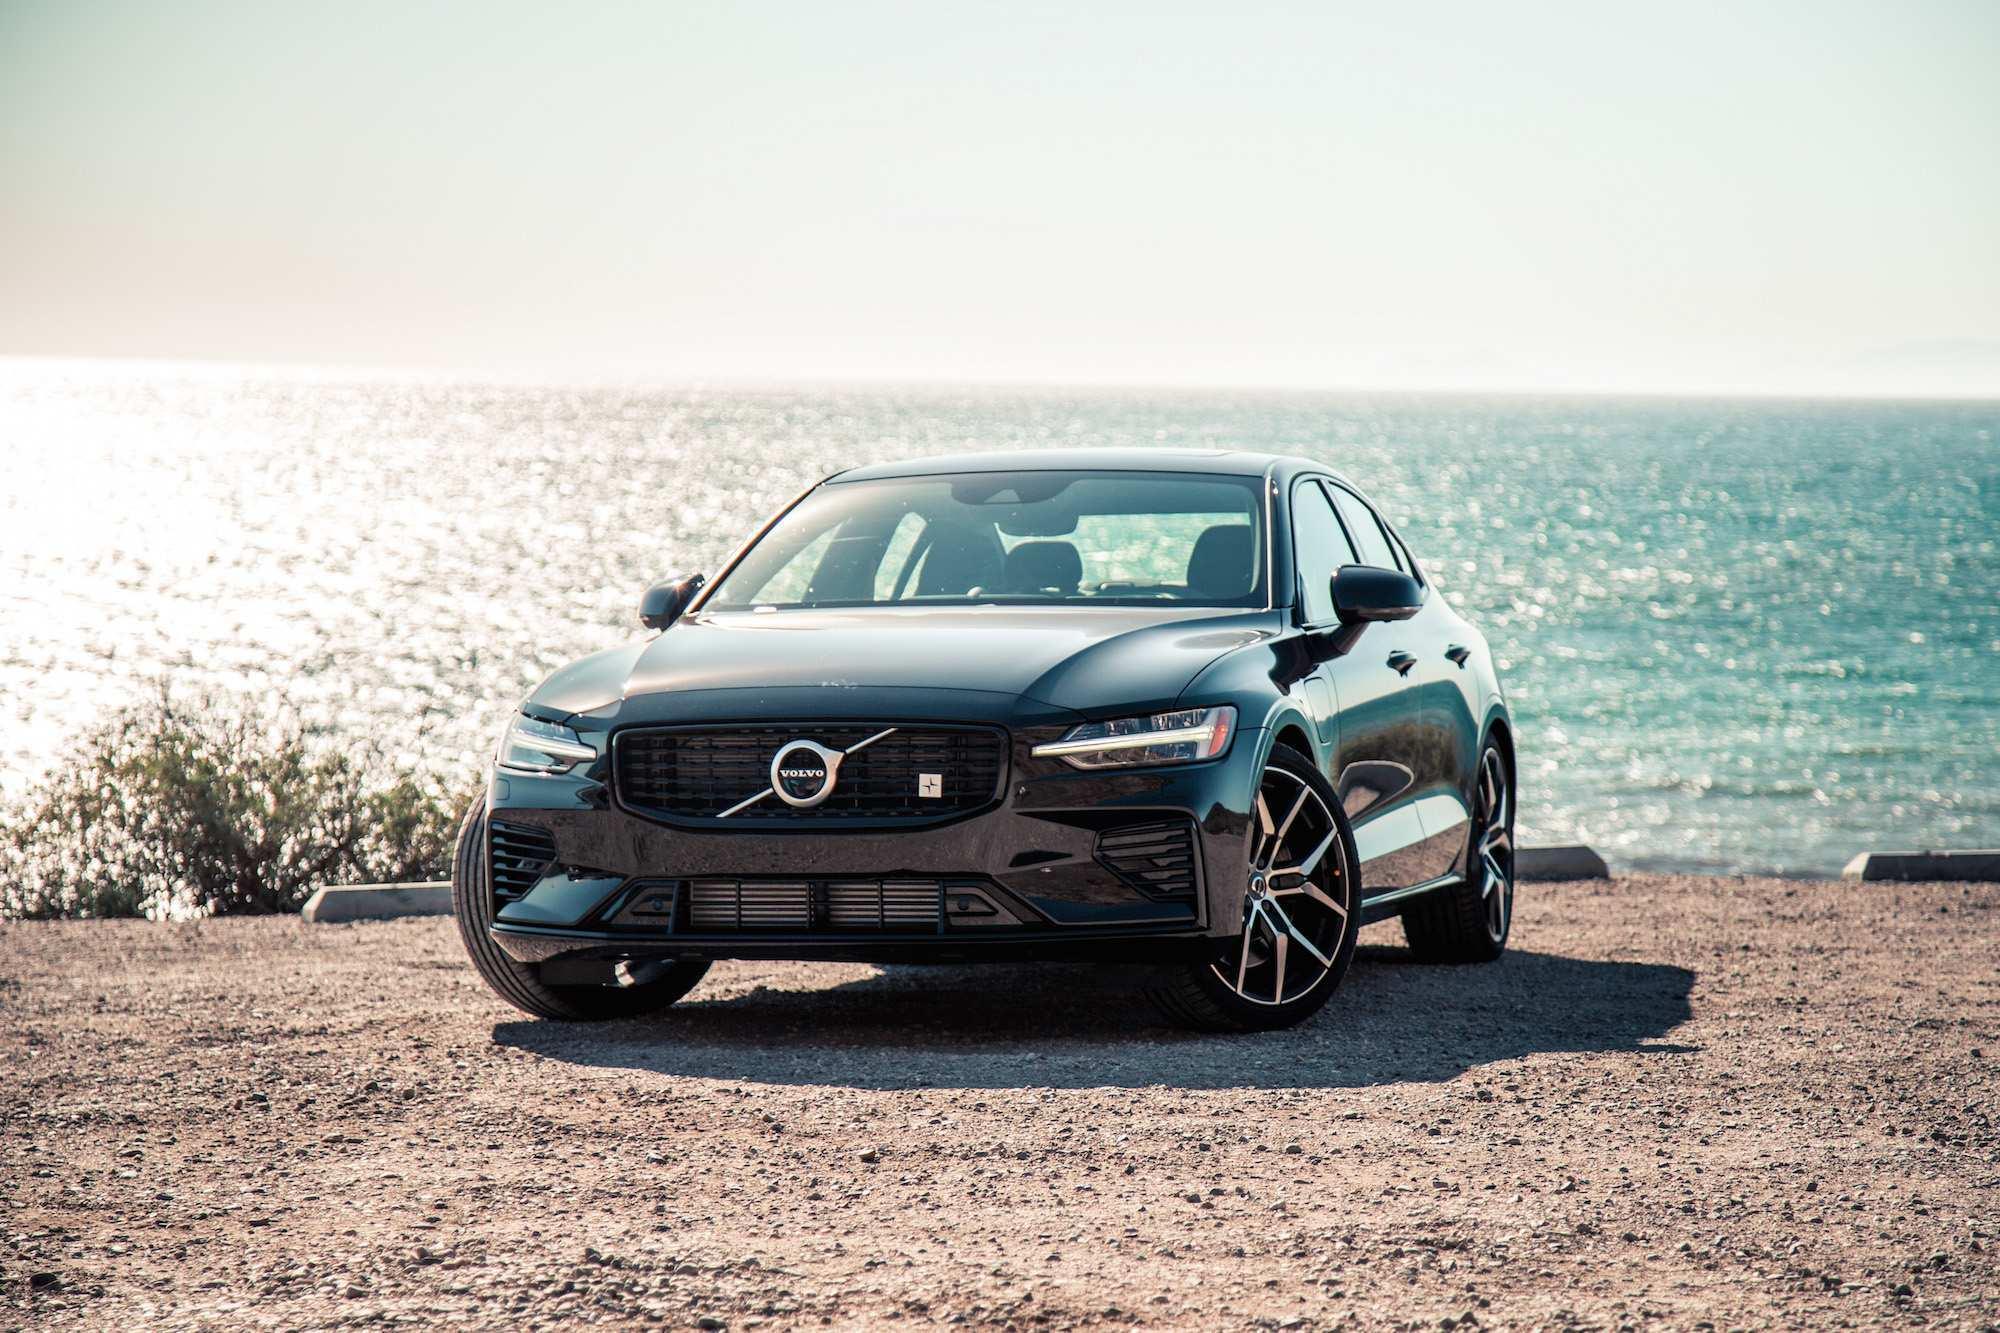 58 All New Volvo S60 2020 Black Pricing for Volvo S60 2020 Black